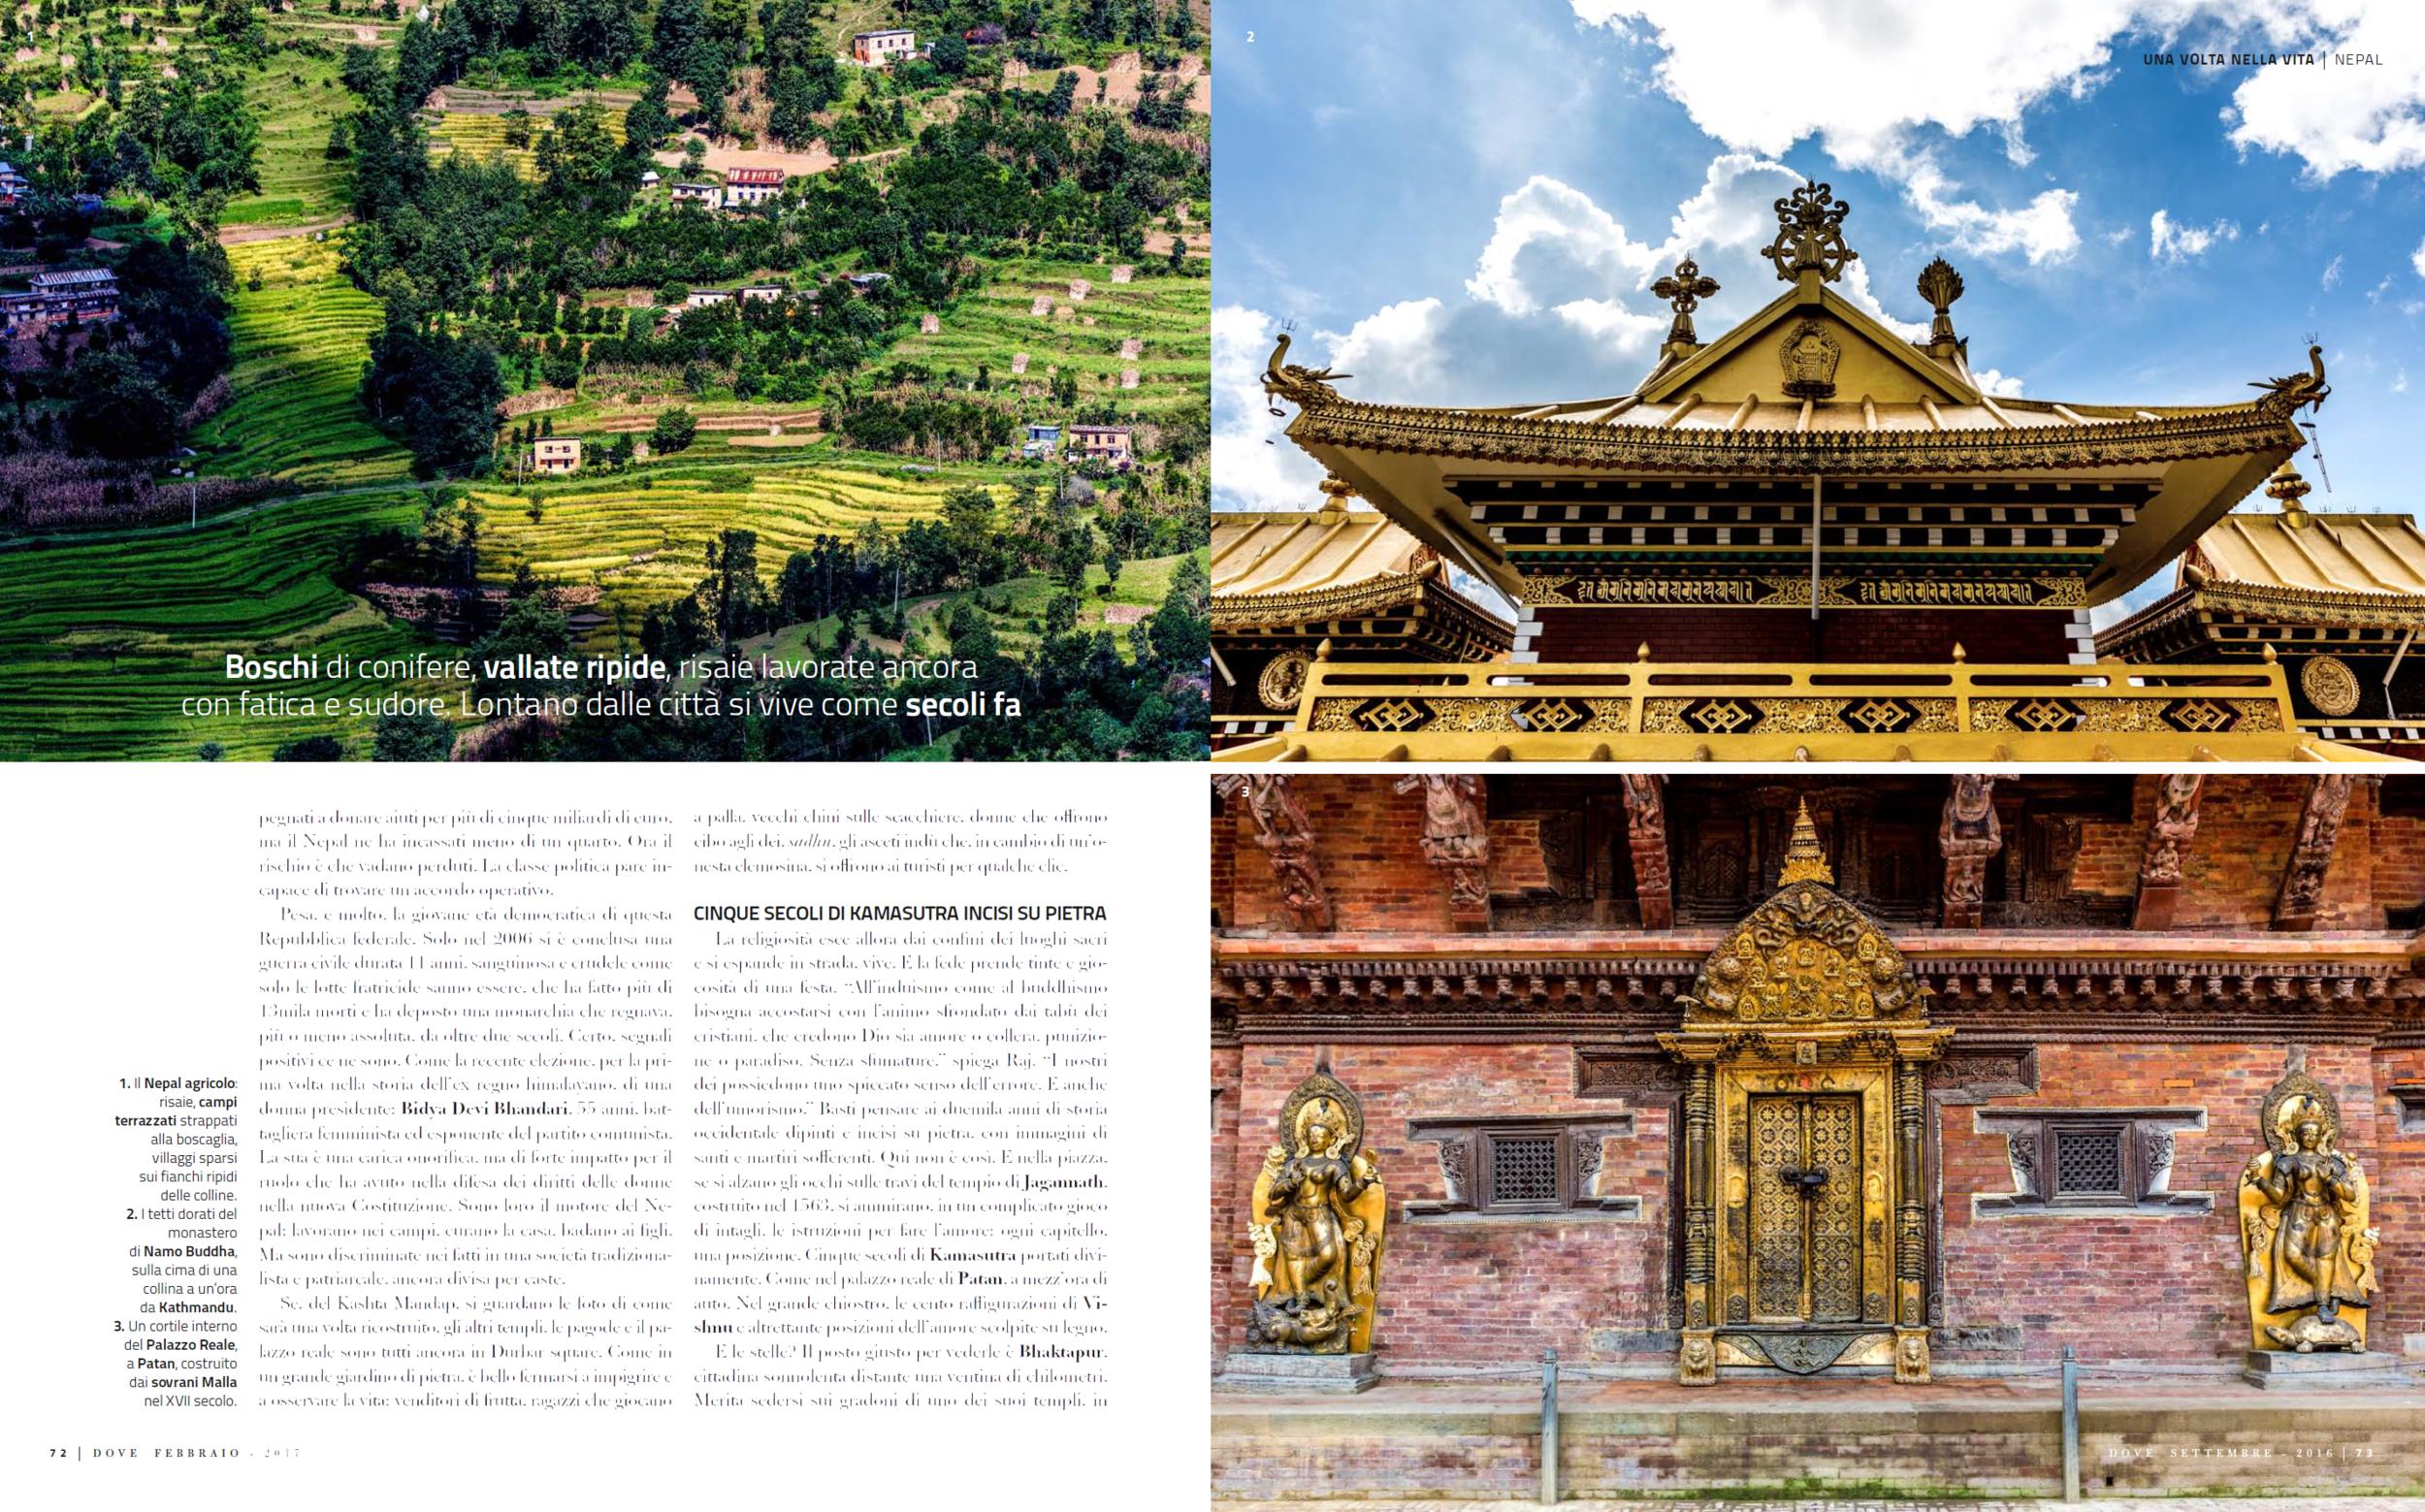 Reportage on Nepal